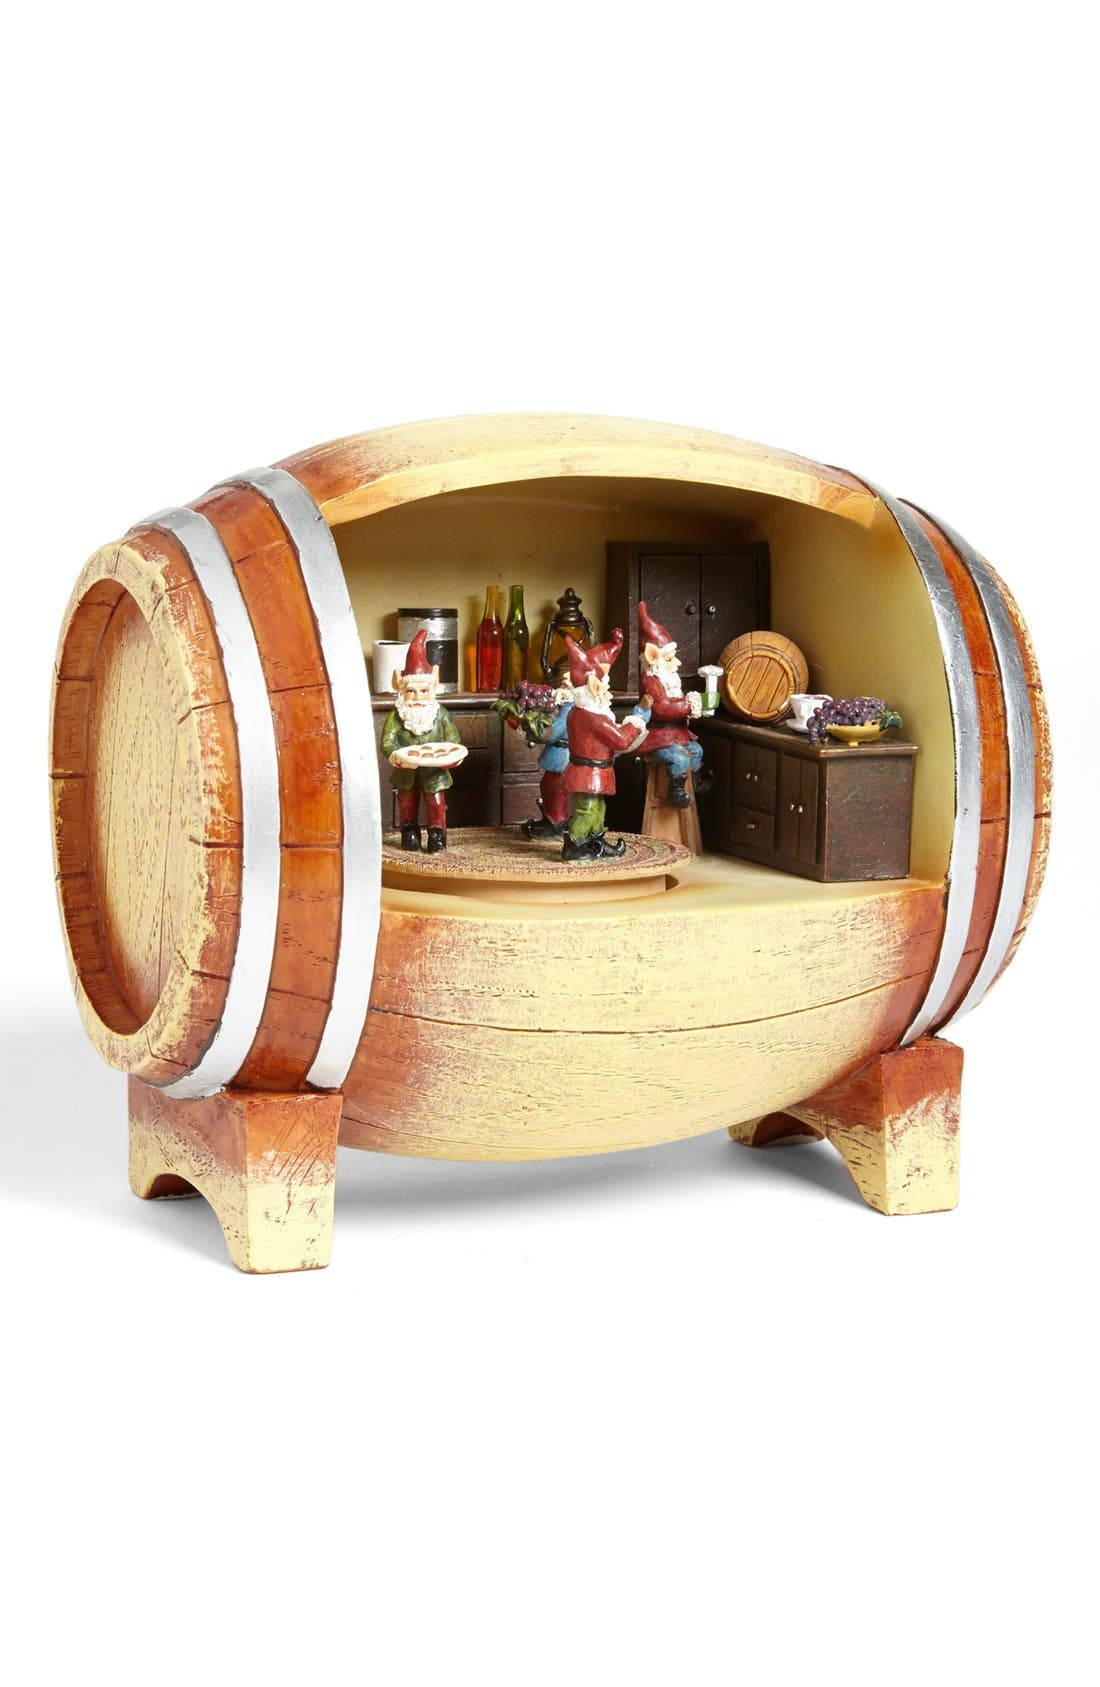 Alternate Image 1 Selected - Roman 'Wine Barrel' Music Box